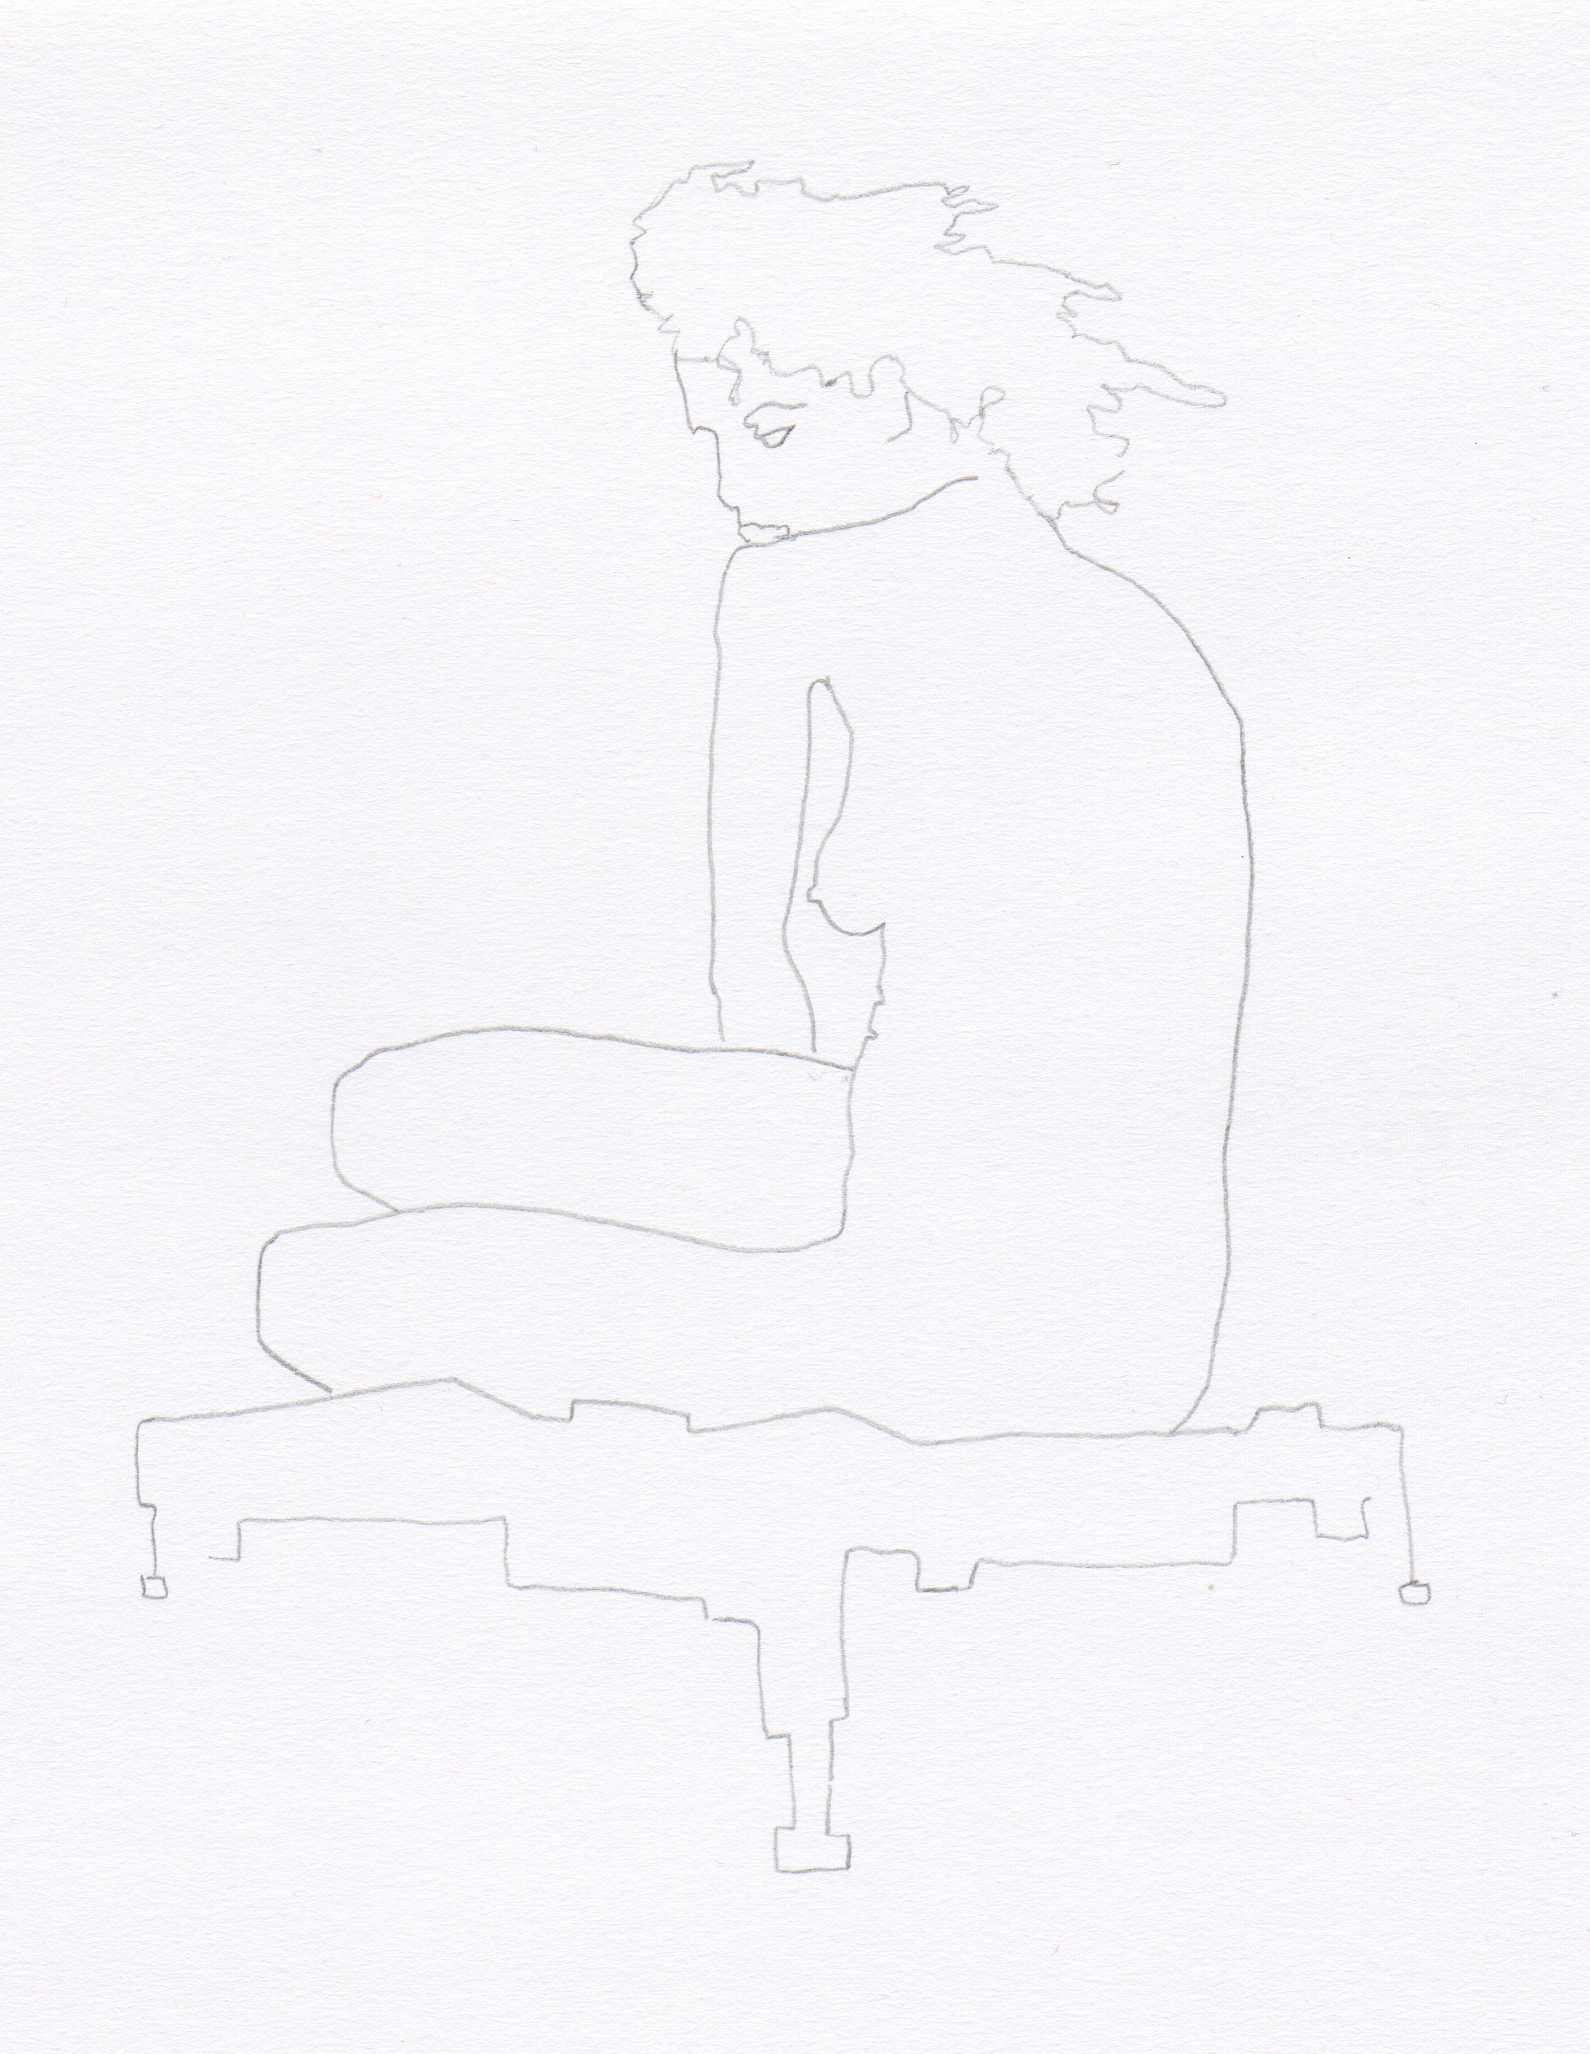 2012_Sketch_F-Beudin_017